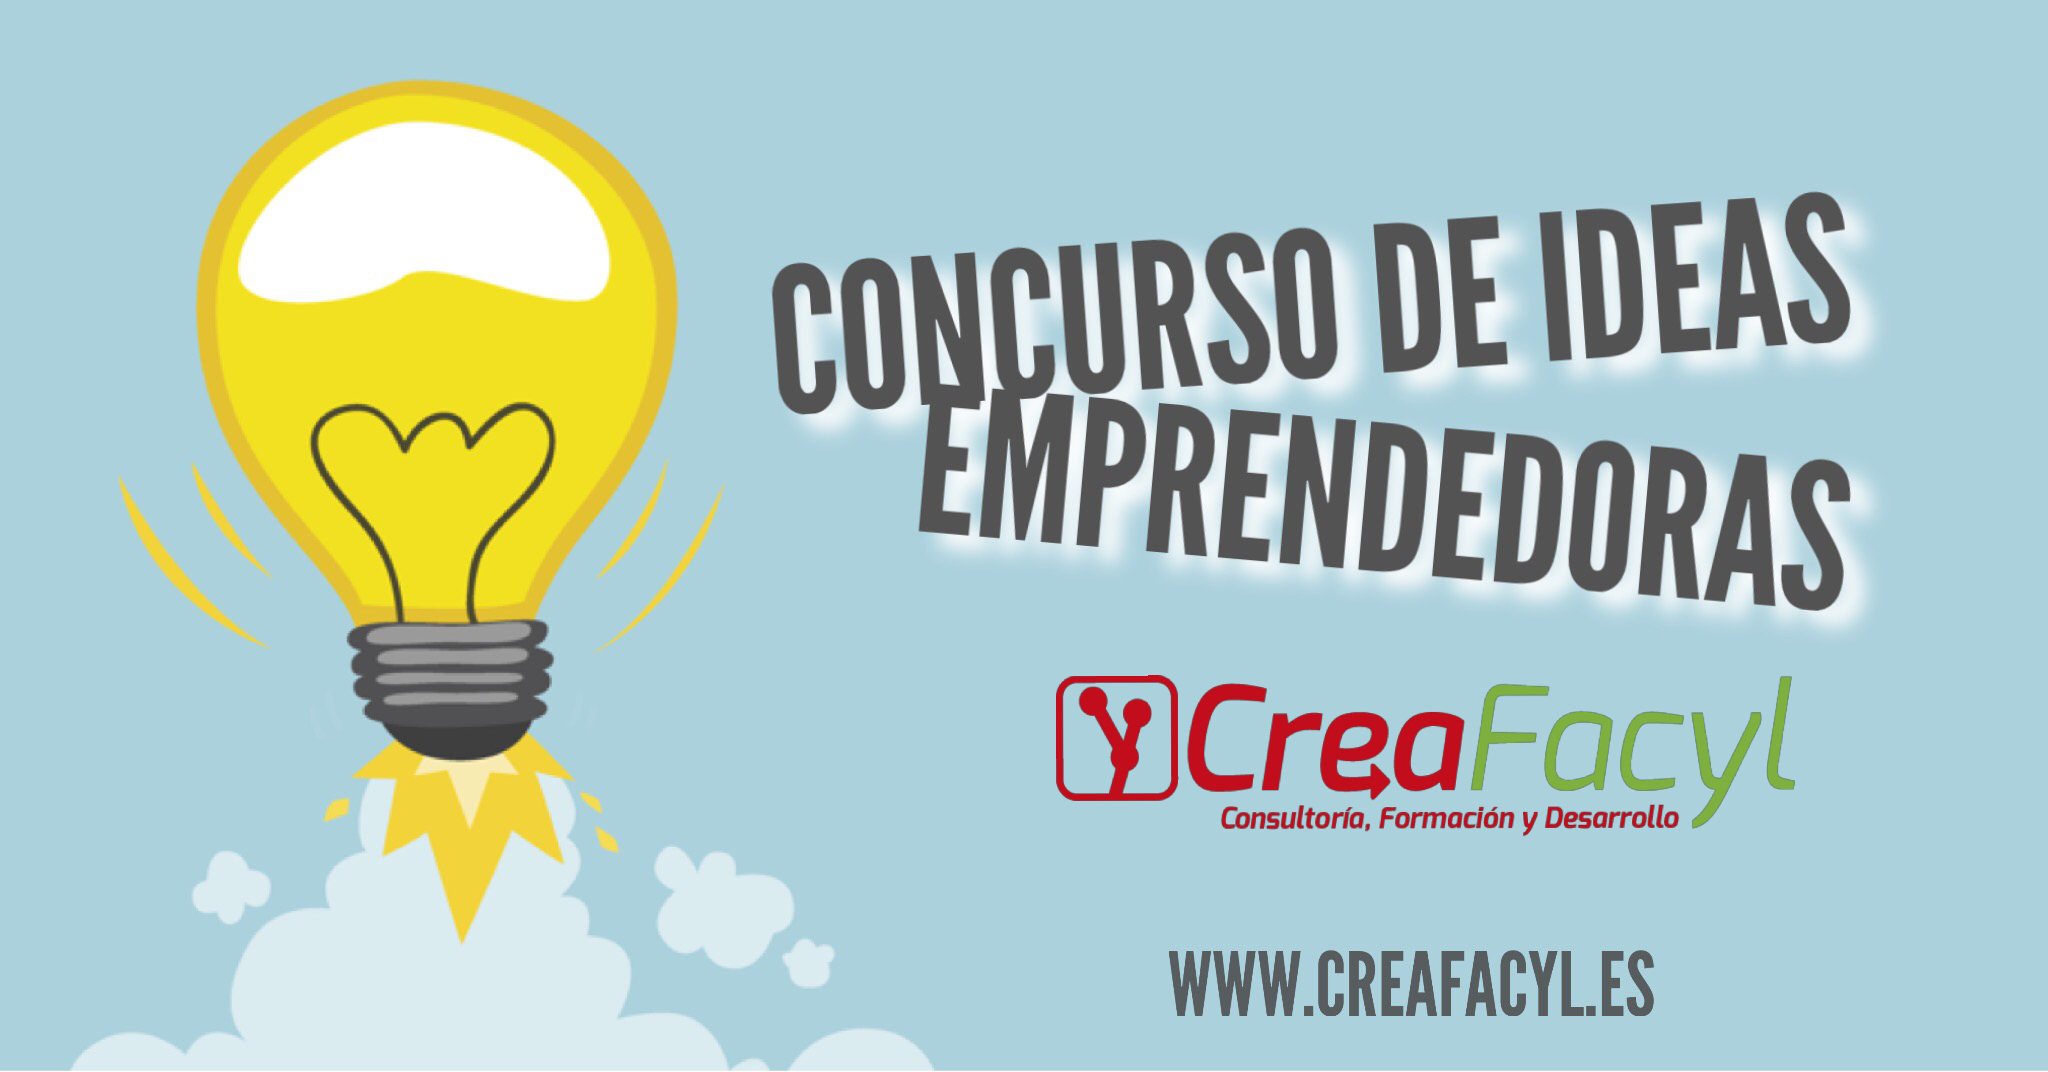 I Concurso Ideas Emprendedoras Creafacyl